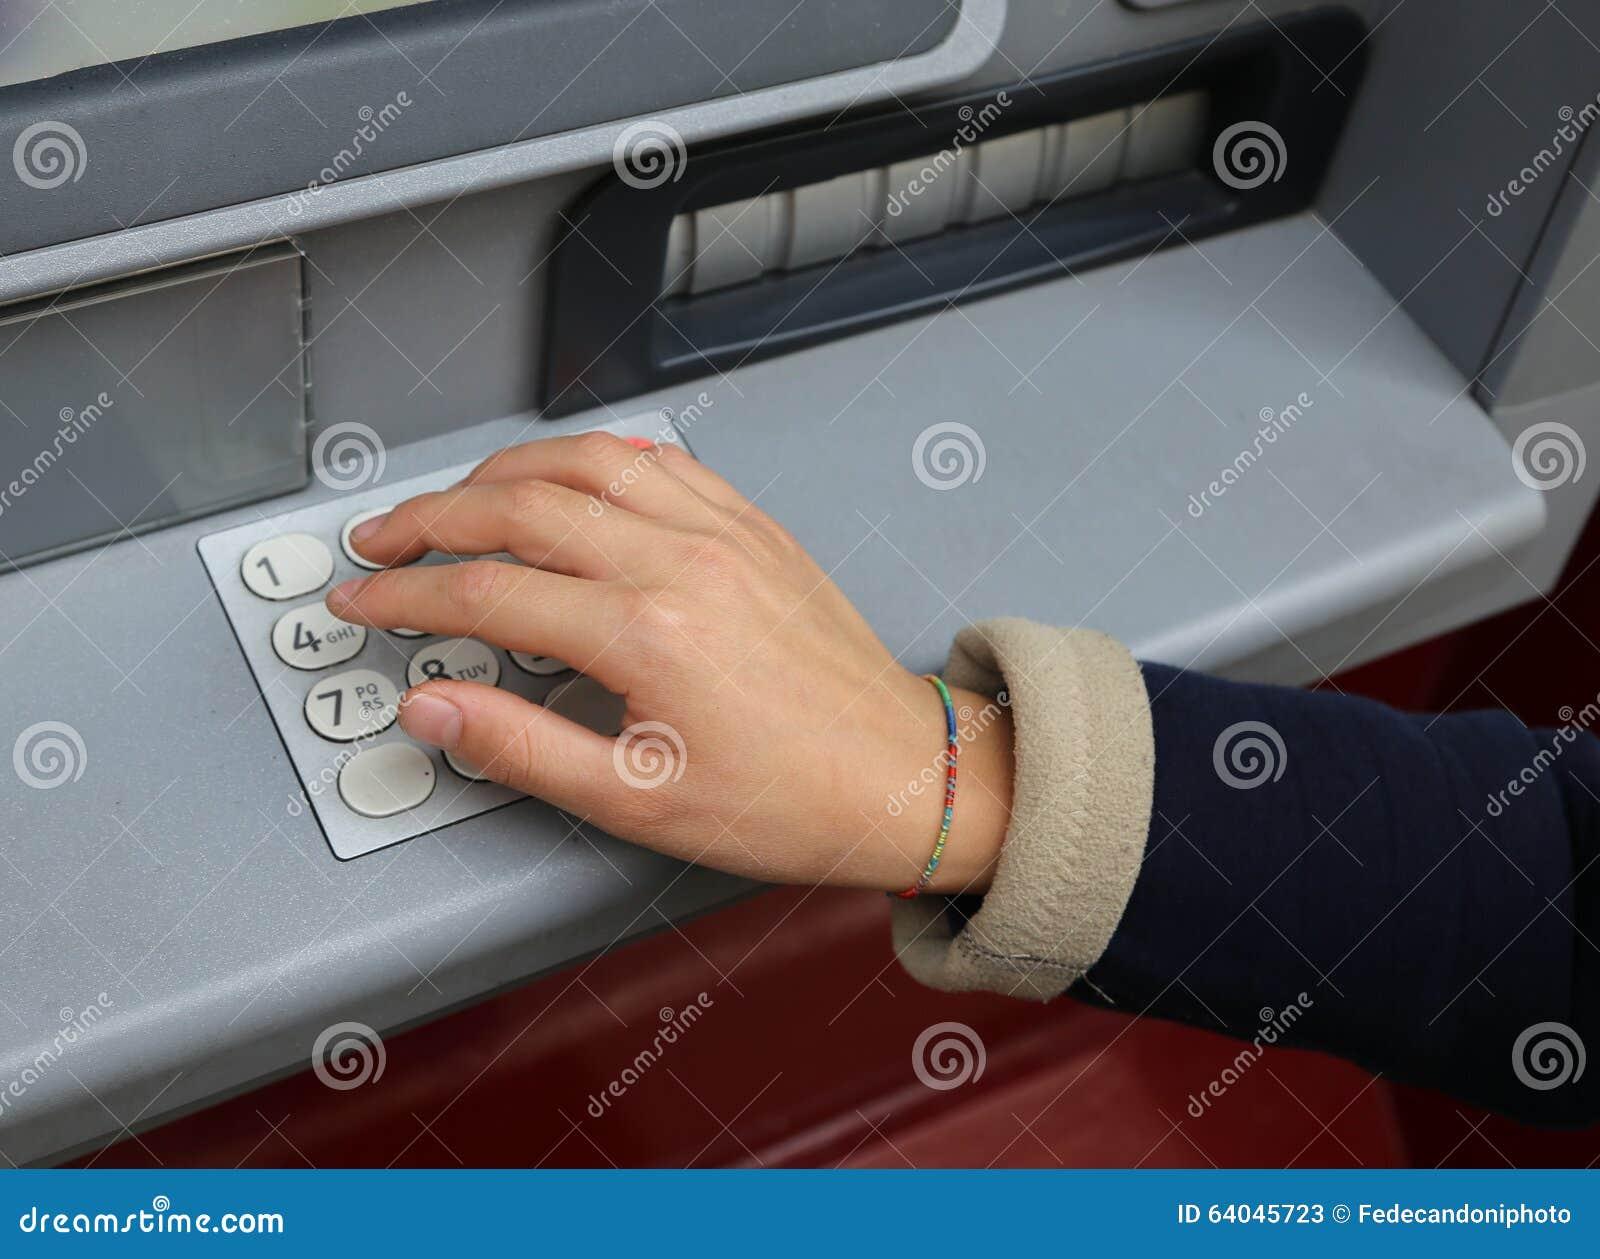 atm keypad codes